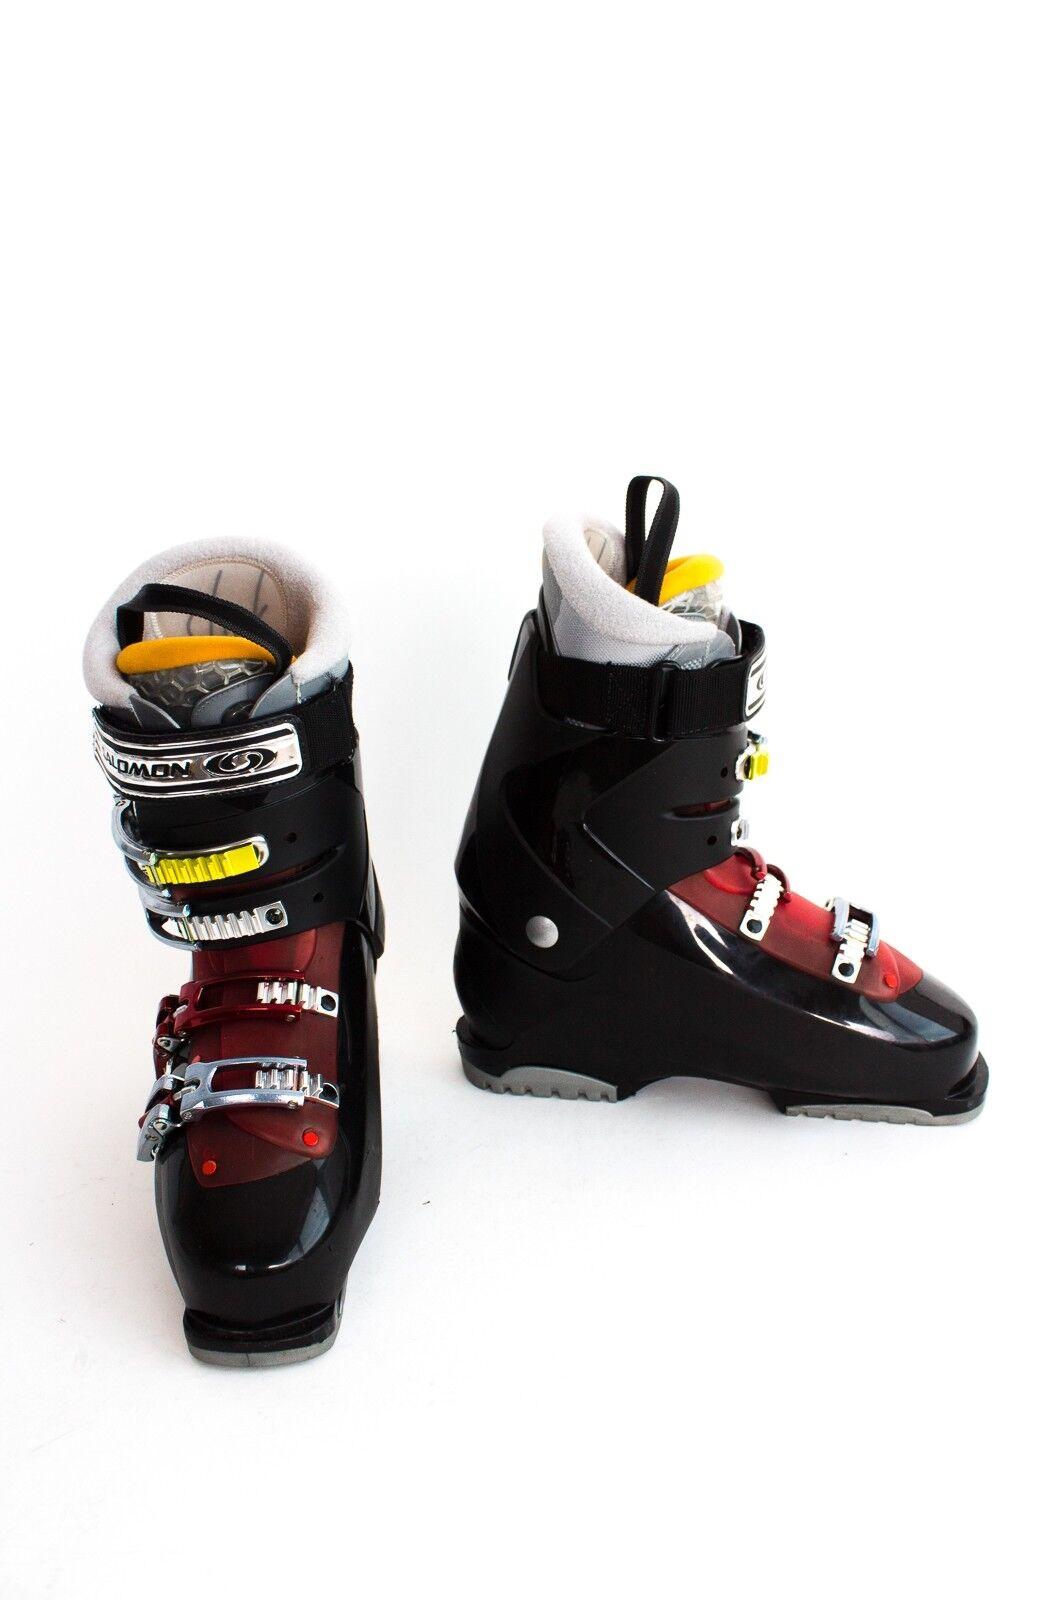 SALOMON PERFORMA Skischuhe Gr. 27 EU 42,5 Unisex Schuhe Schwarz Rot